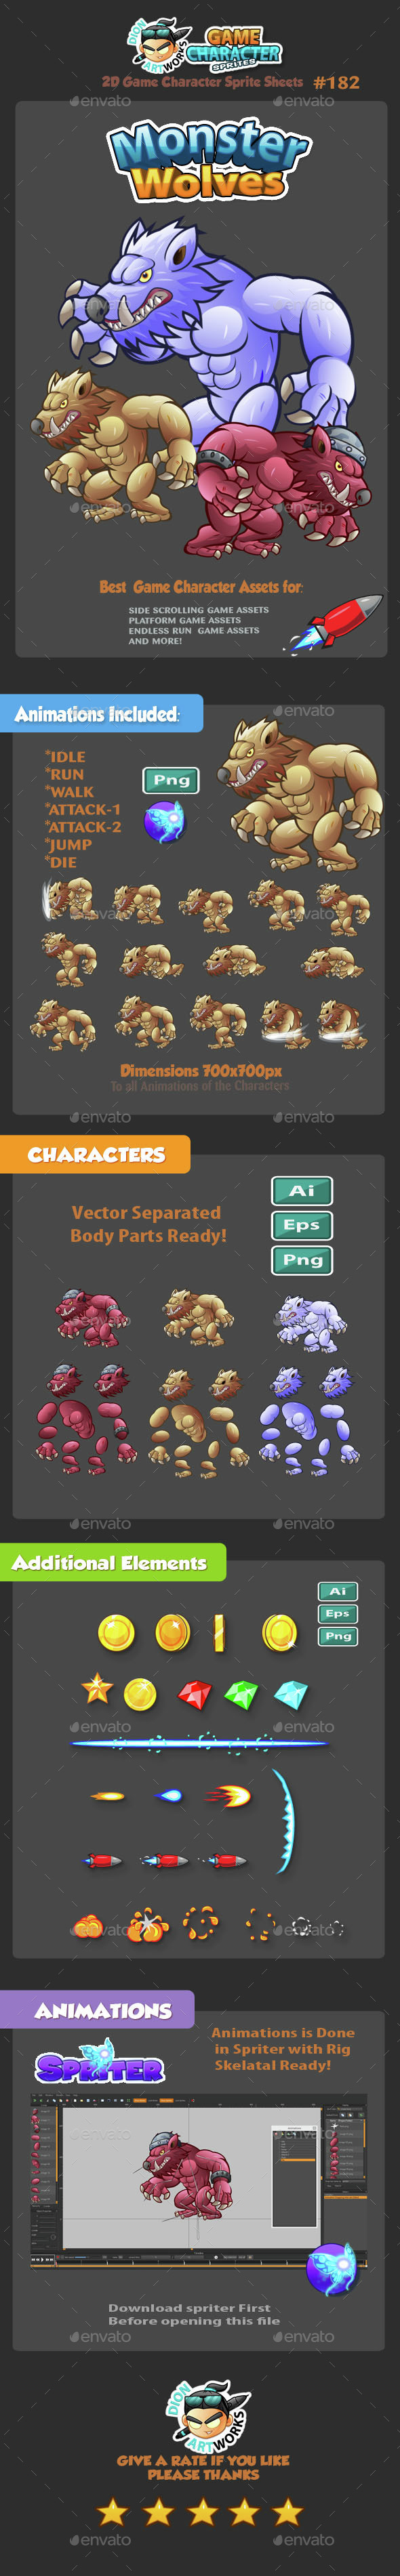 Monster Wolves 2D Game Character Sprites 182 - Sprites Game Assets